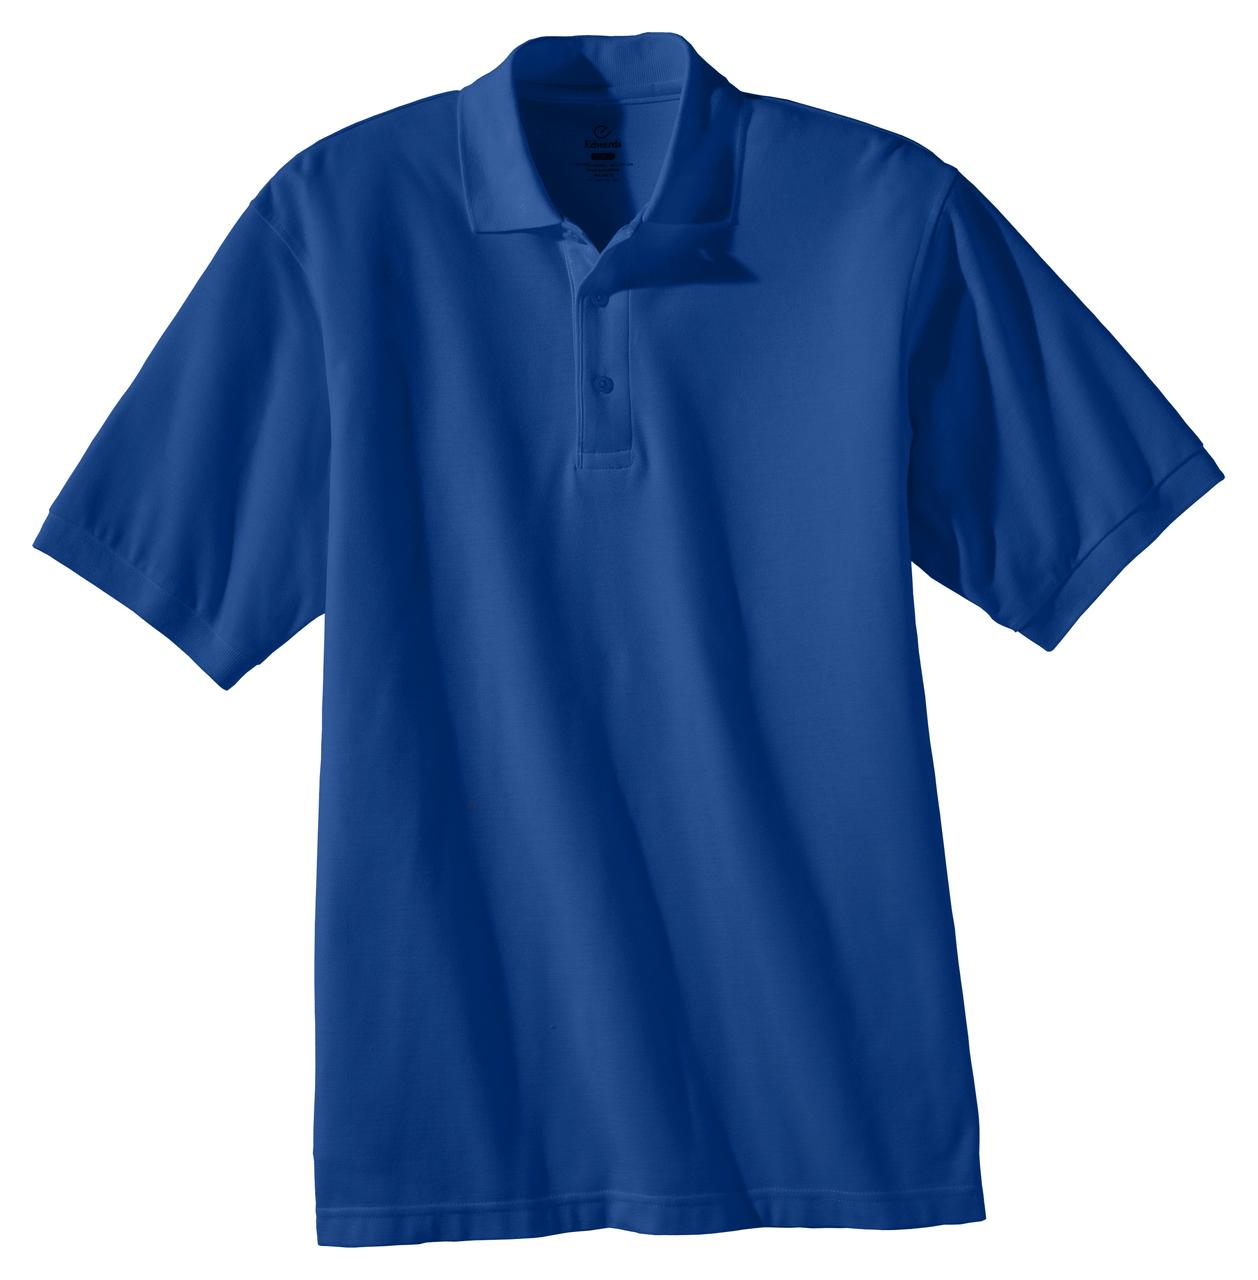 Men's Soft Touch Pique Polo Shirt